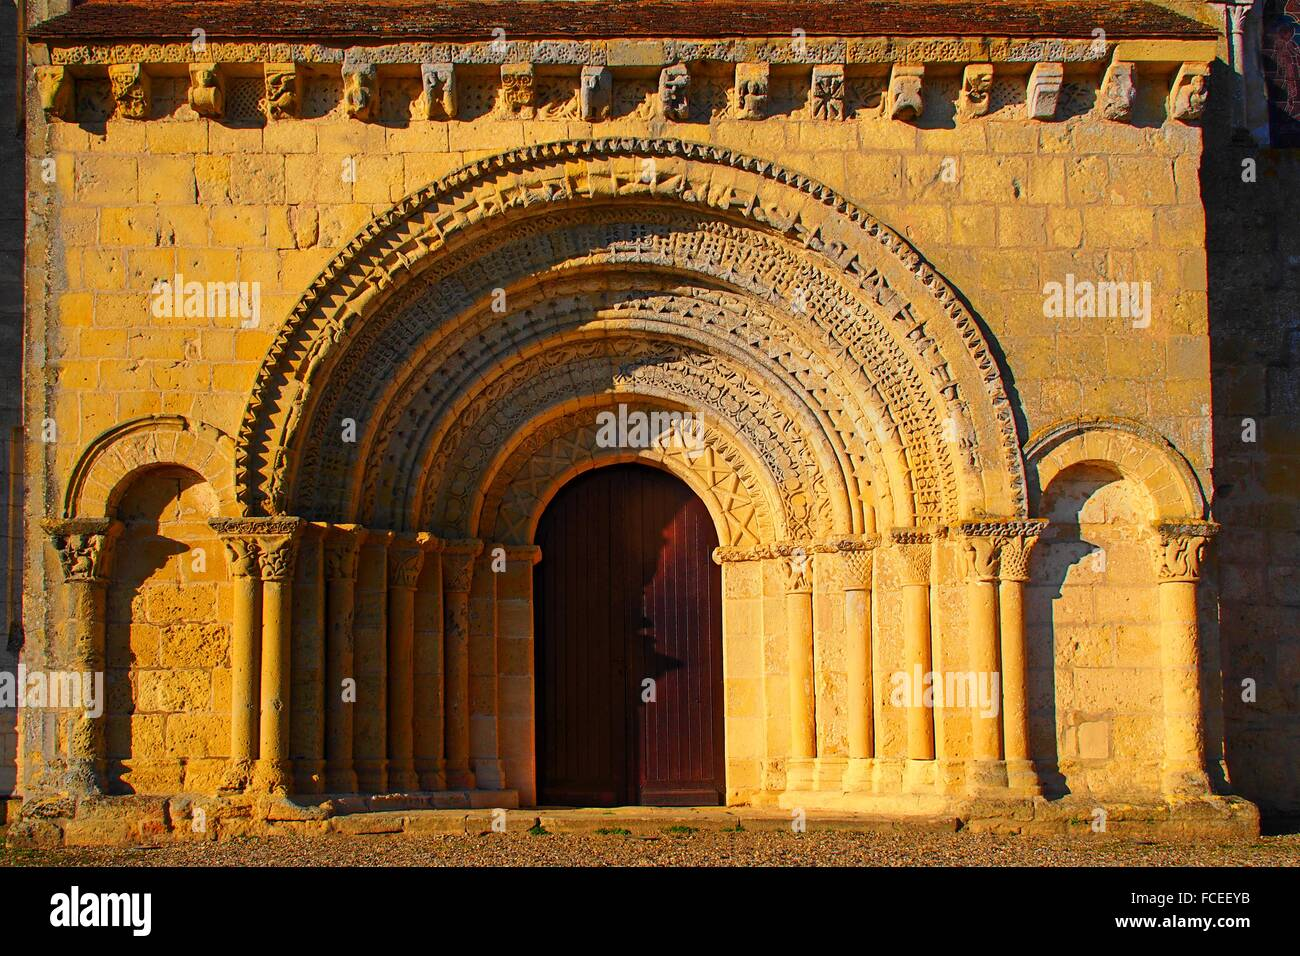 Lateral entrance door to the Romanesque church of Saint Martin de Sescas, 12th century, Gironde, Aquitaine, France - Stock Image